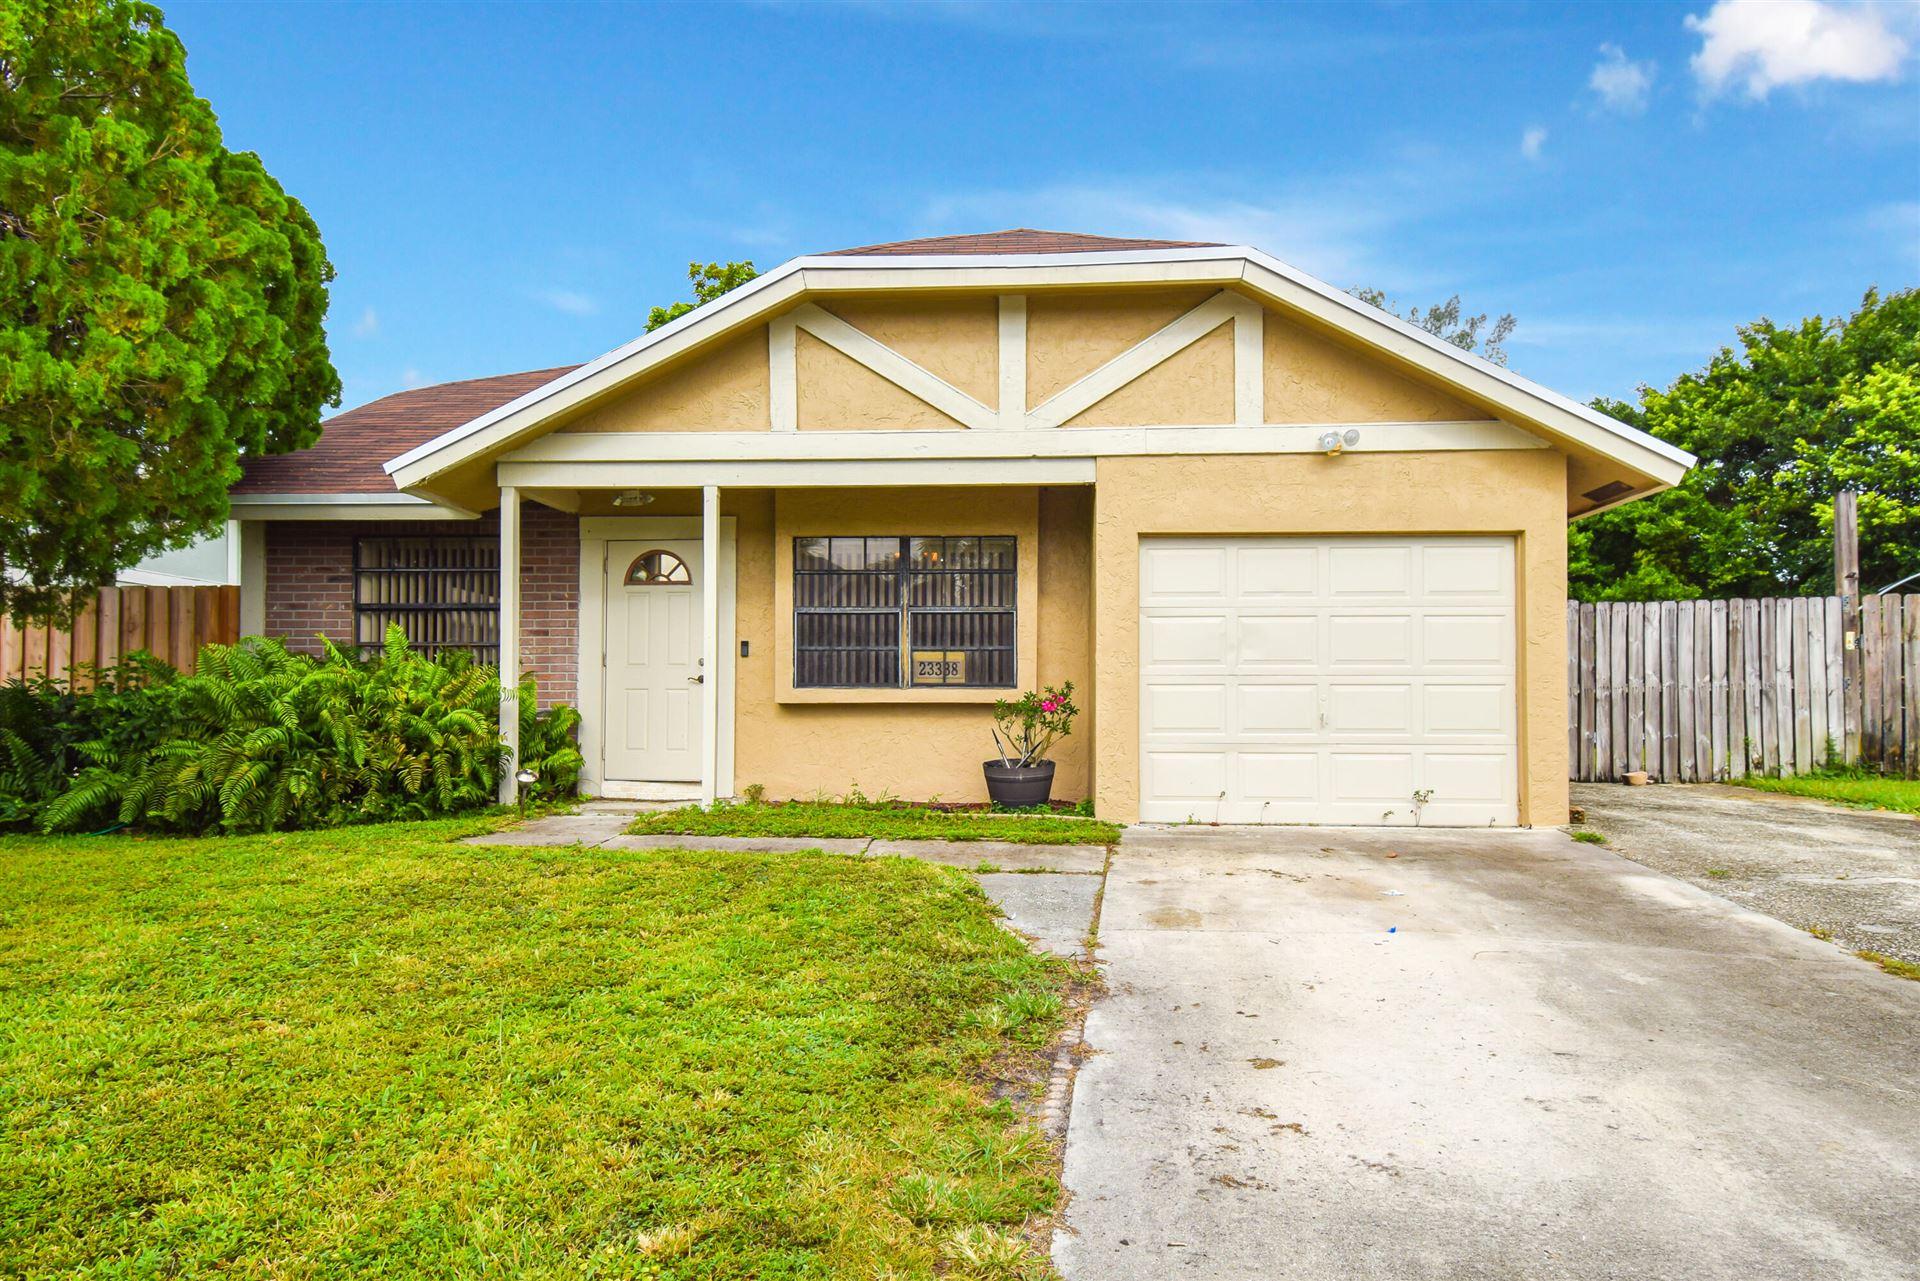 23338 Country Club Drive, Boca Raton, FL 33428 - MLS#: RX-10743383